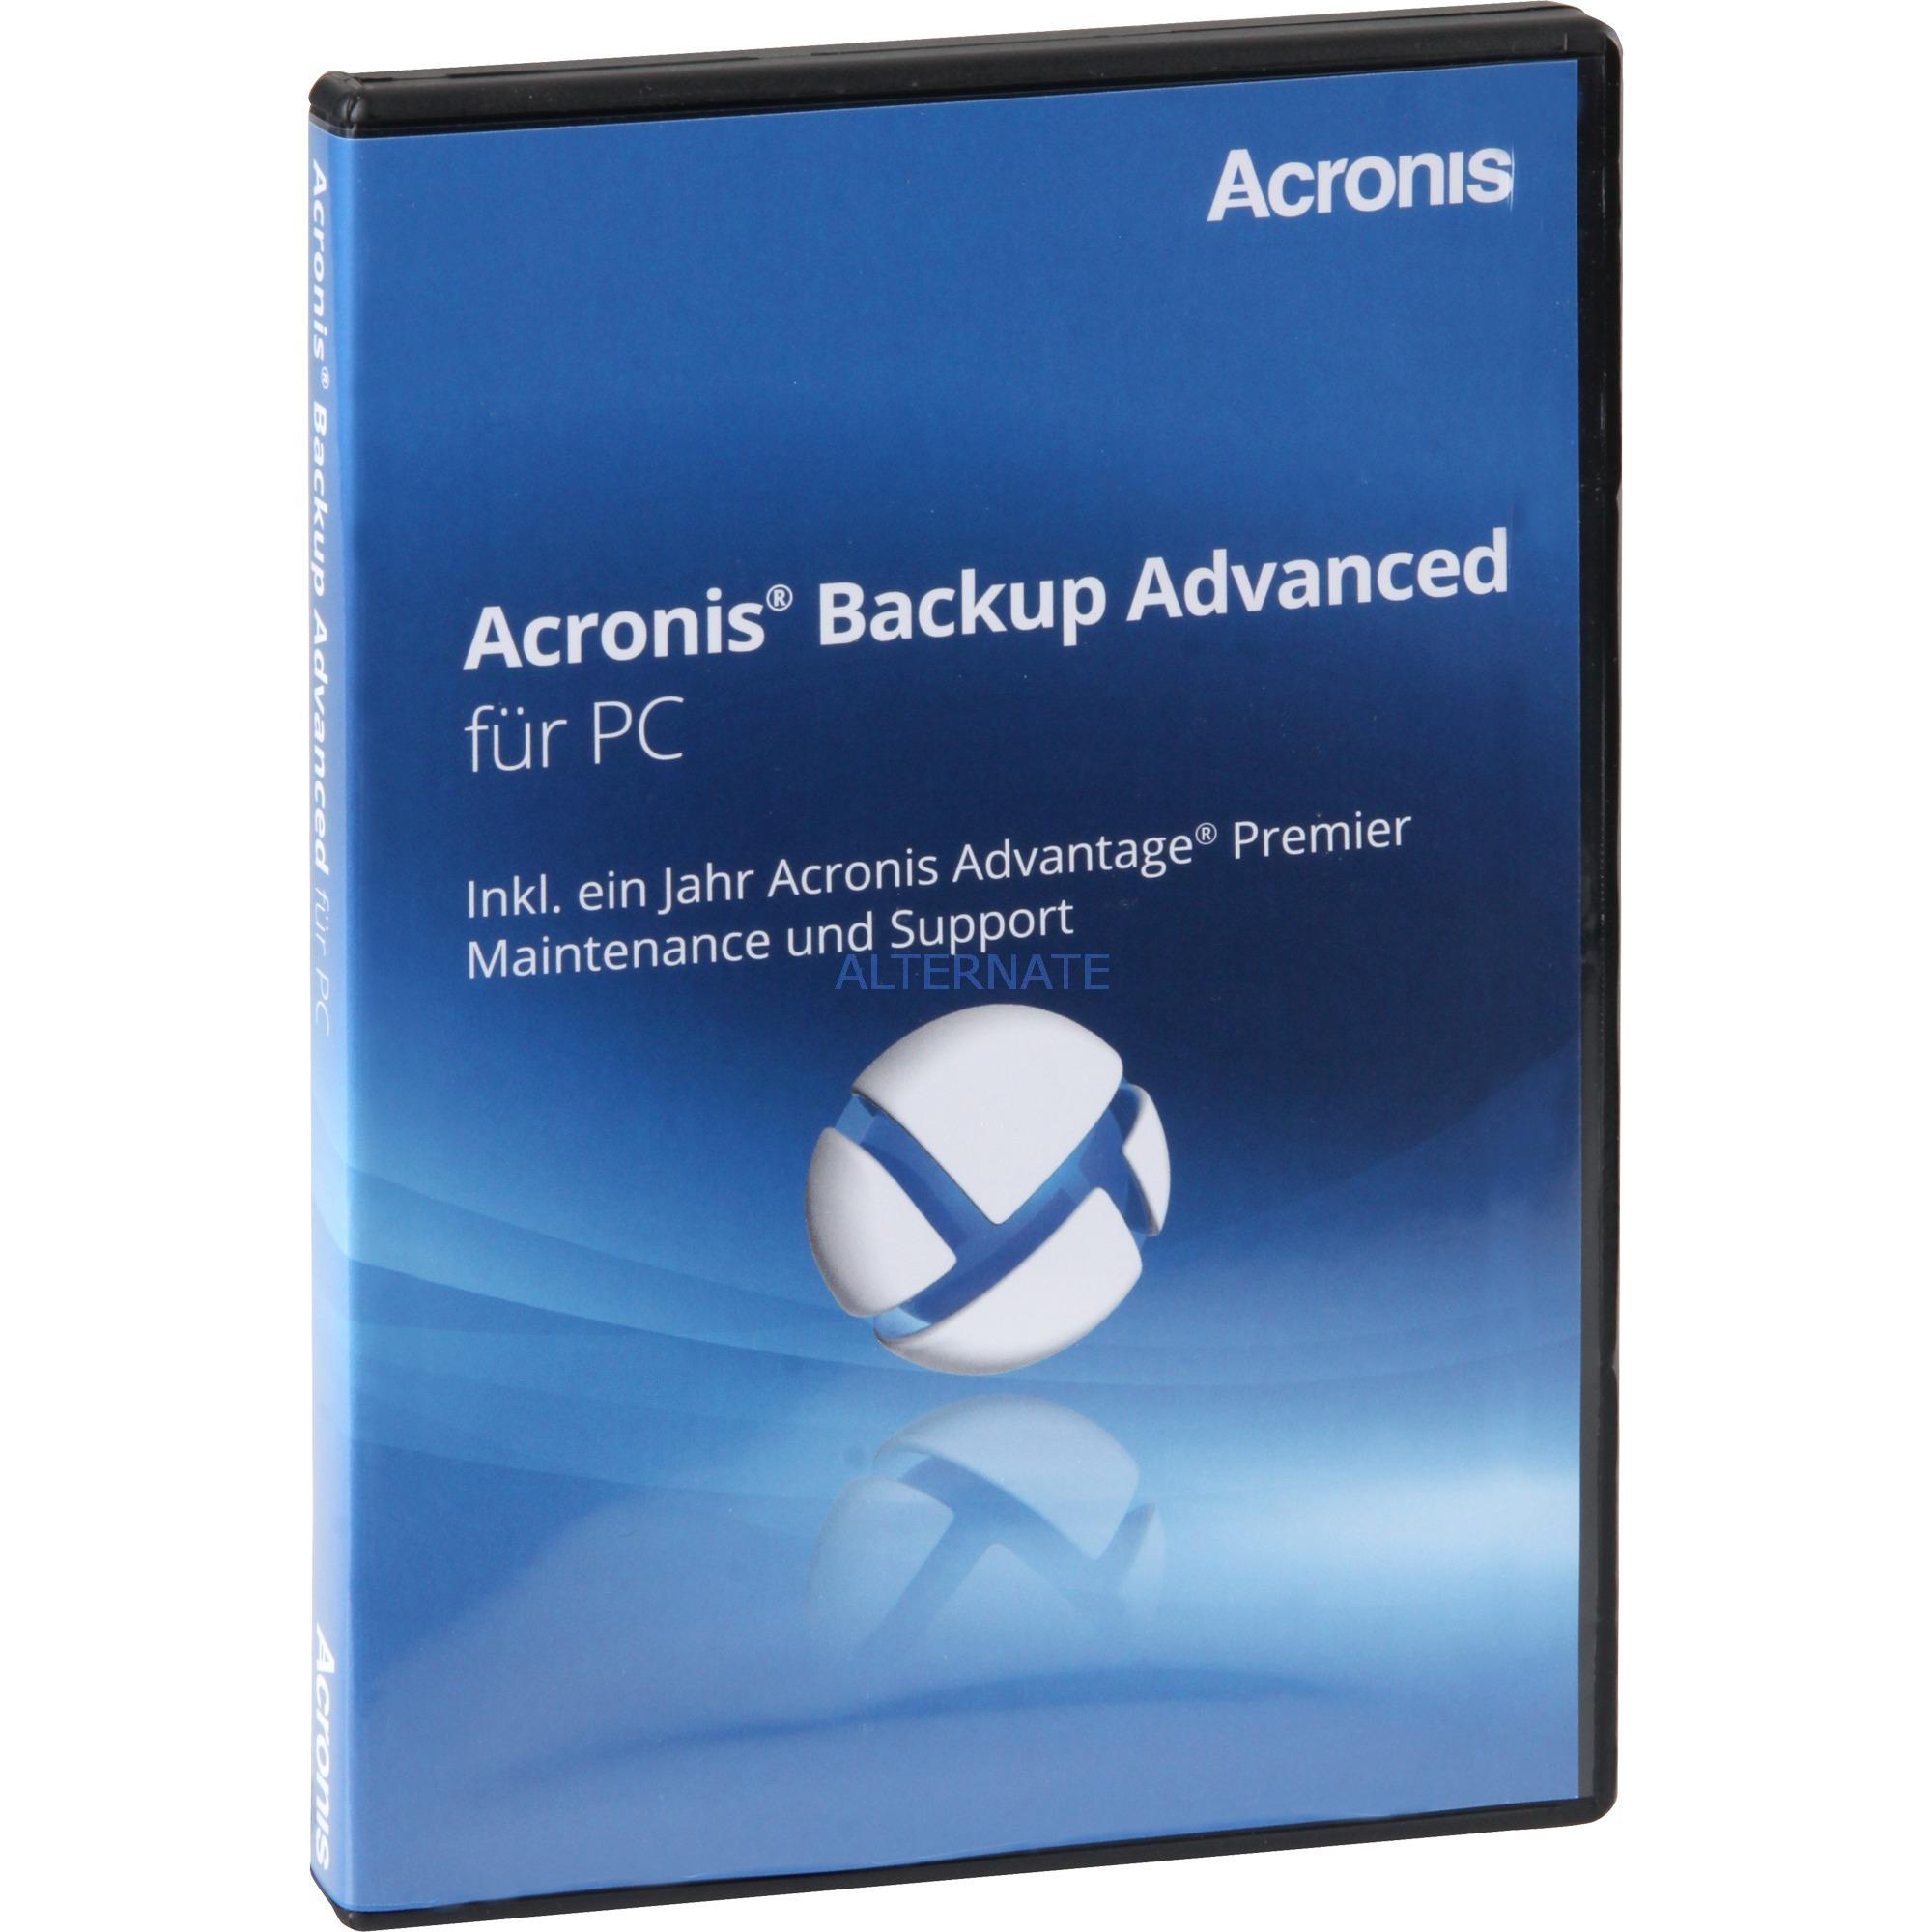 backup-advanced-fuer-pc-v115-software